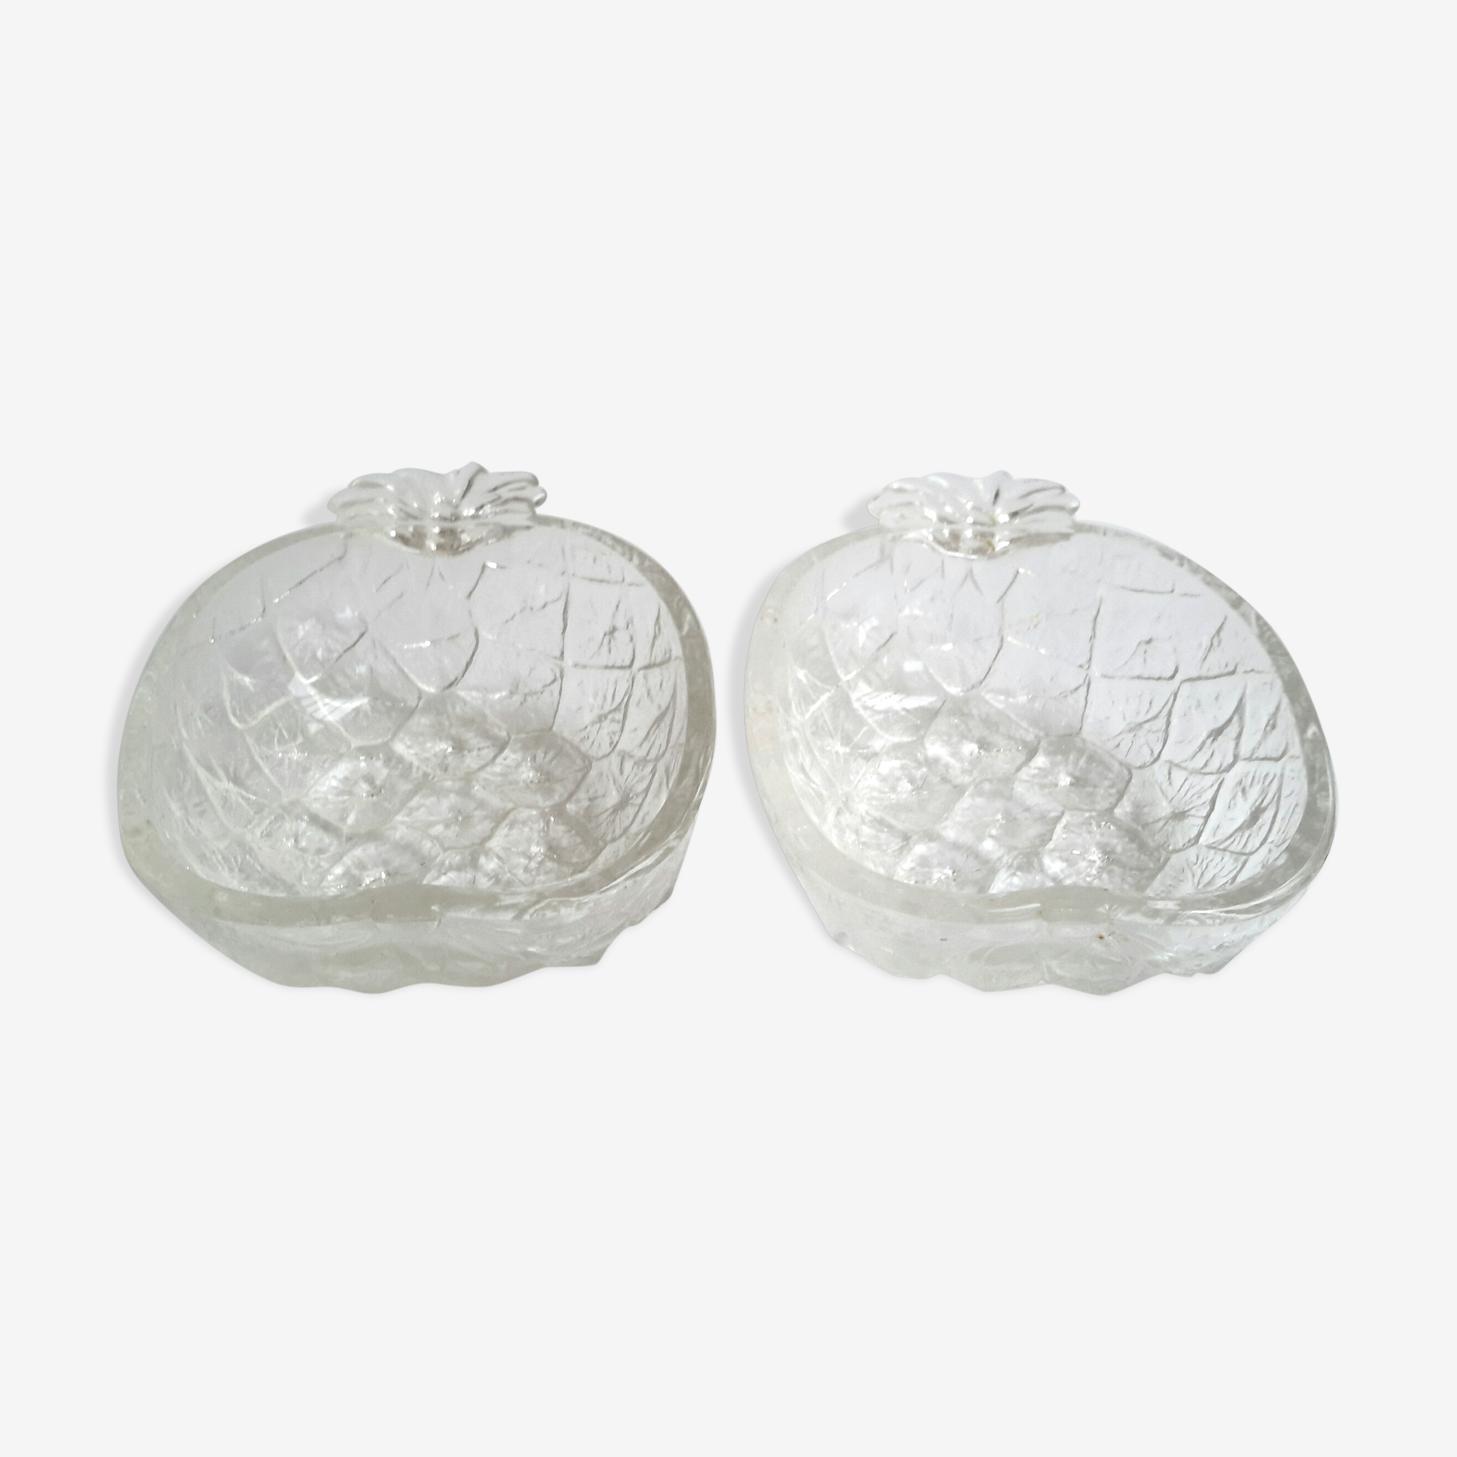 Paire de ramequins en verre forme ananas